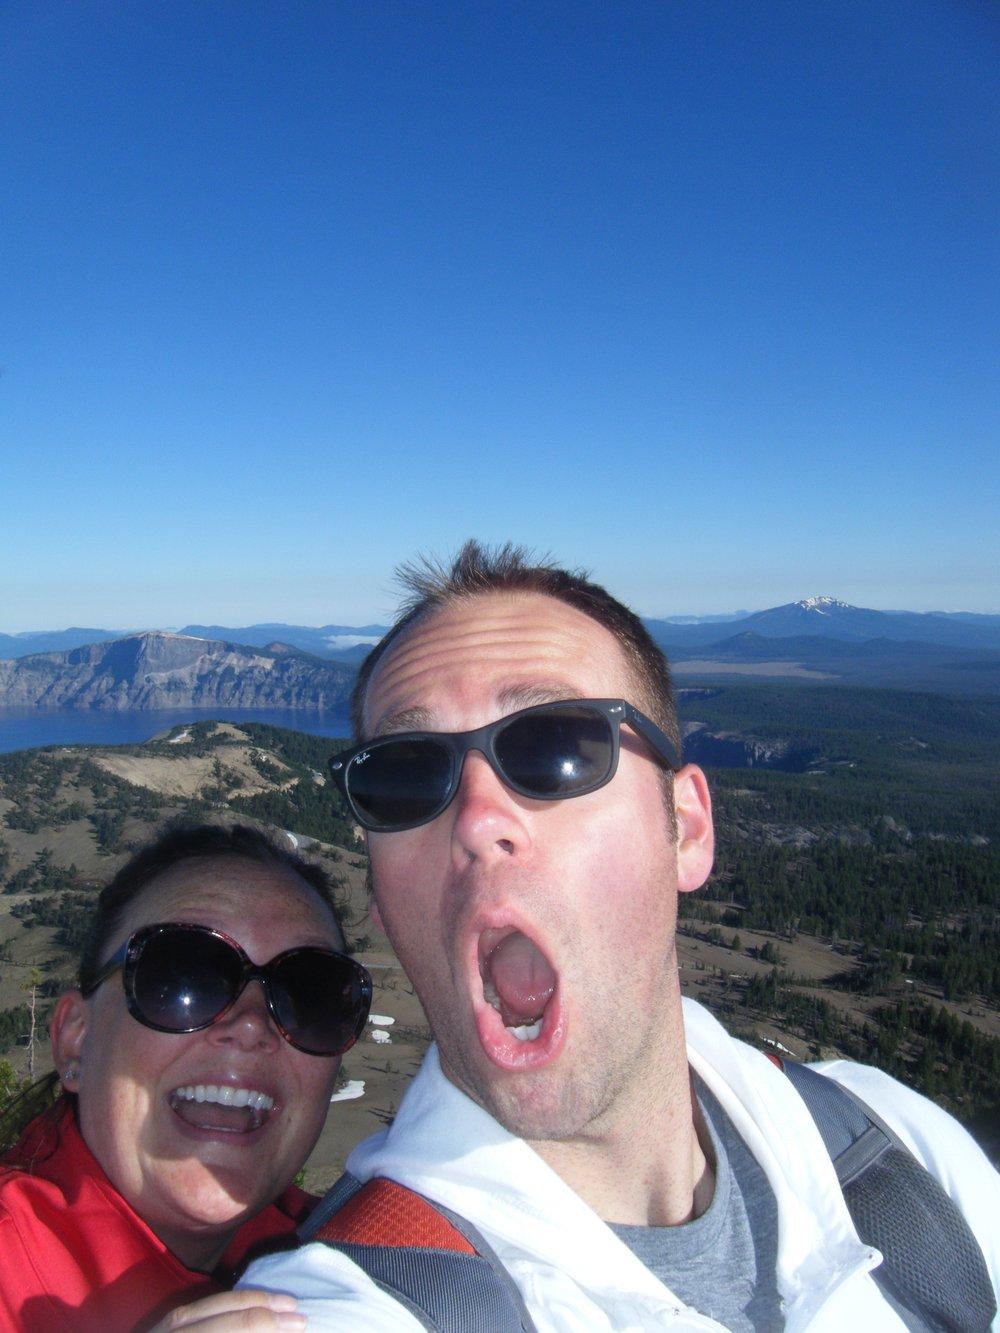 A little selfie at the top of Mt Scott!